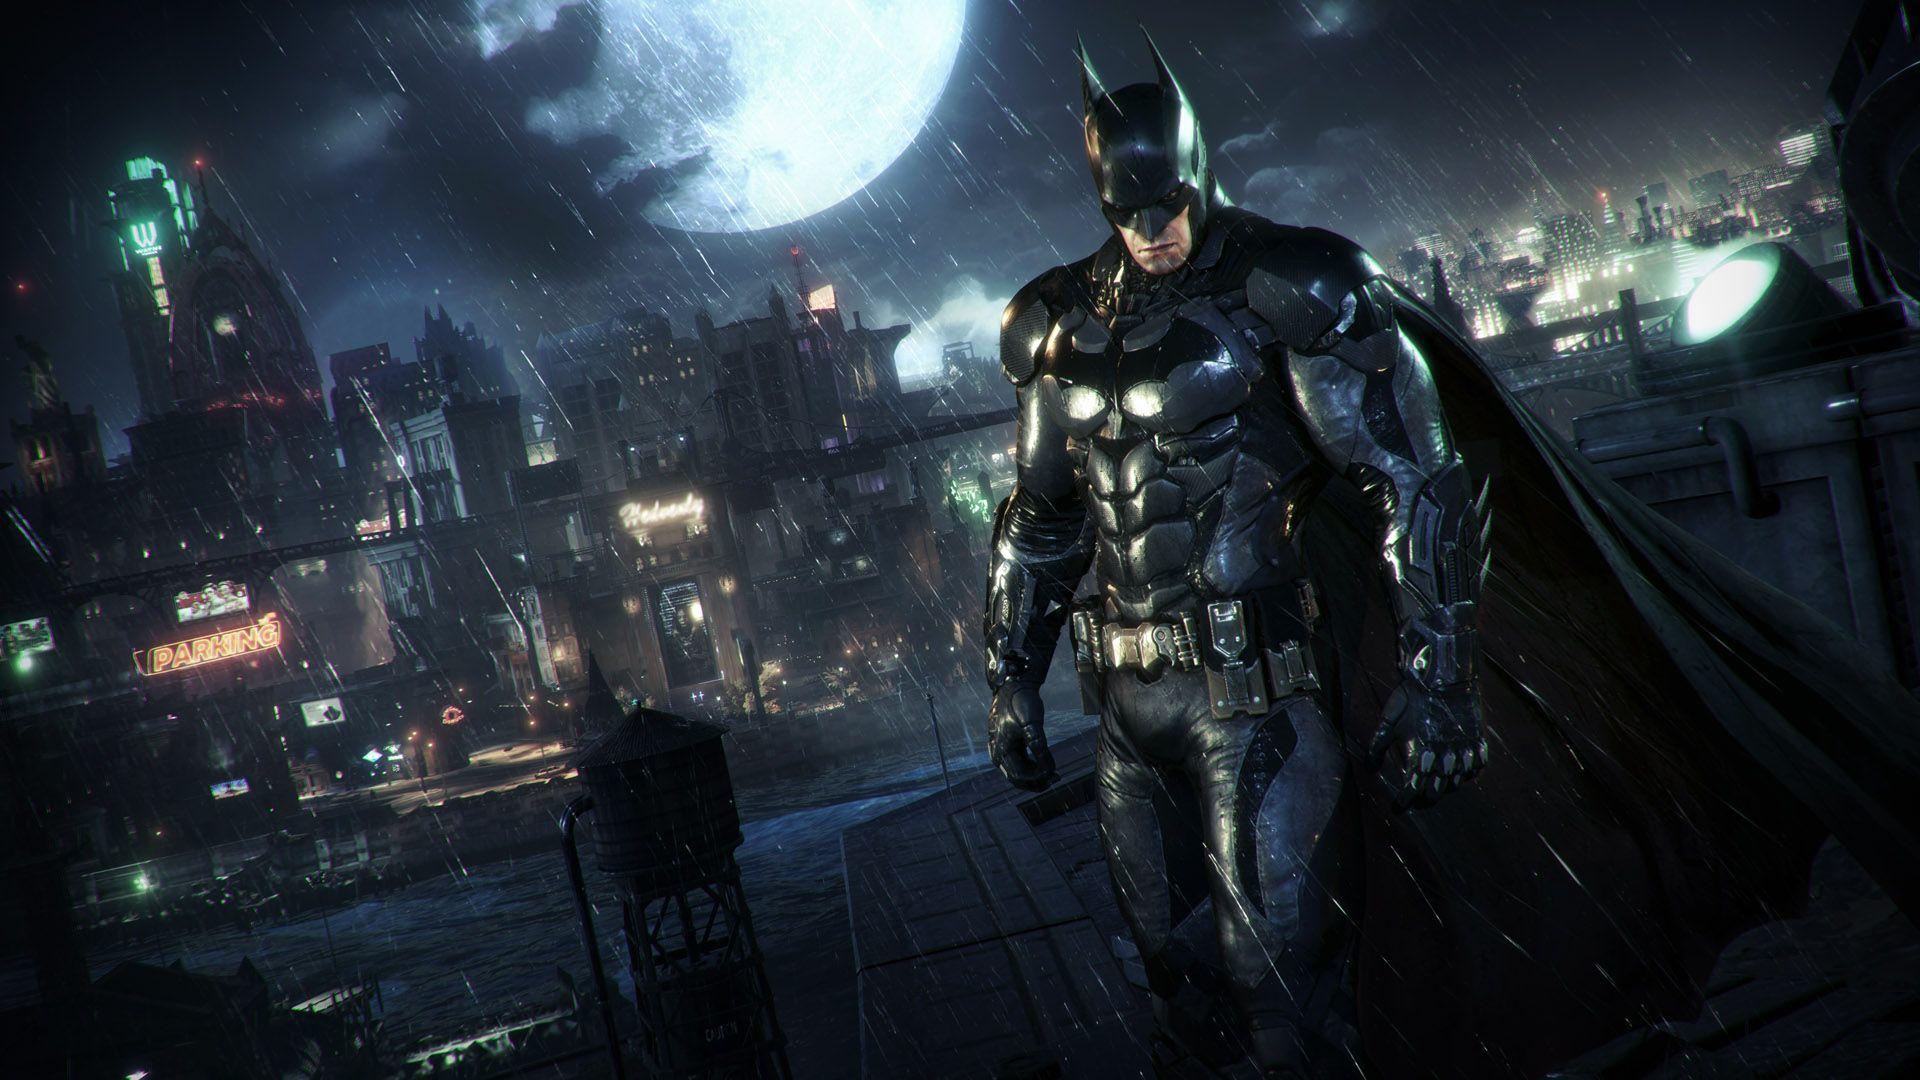 Cartoonmag Fumetti Animazione Cinema Batman Caballero De Arkham Caballero De Arkham Batman